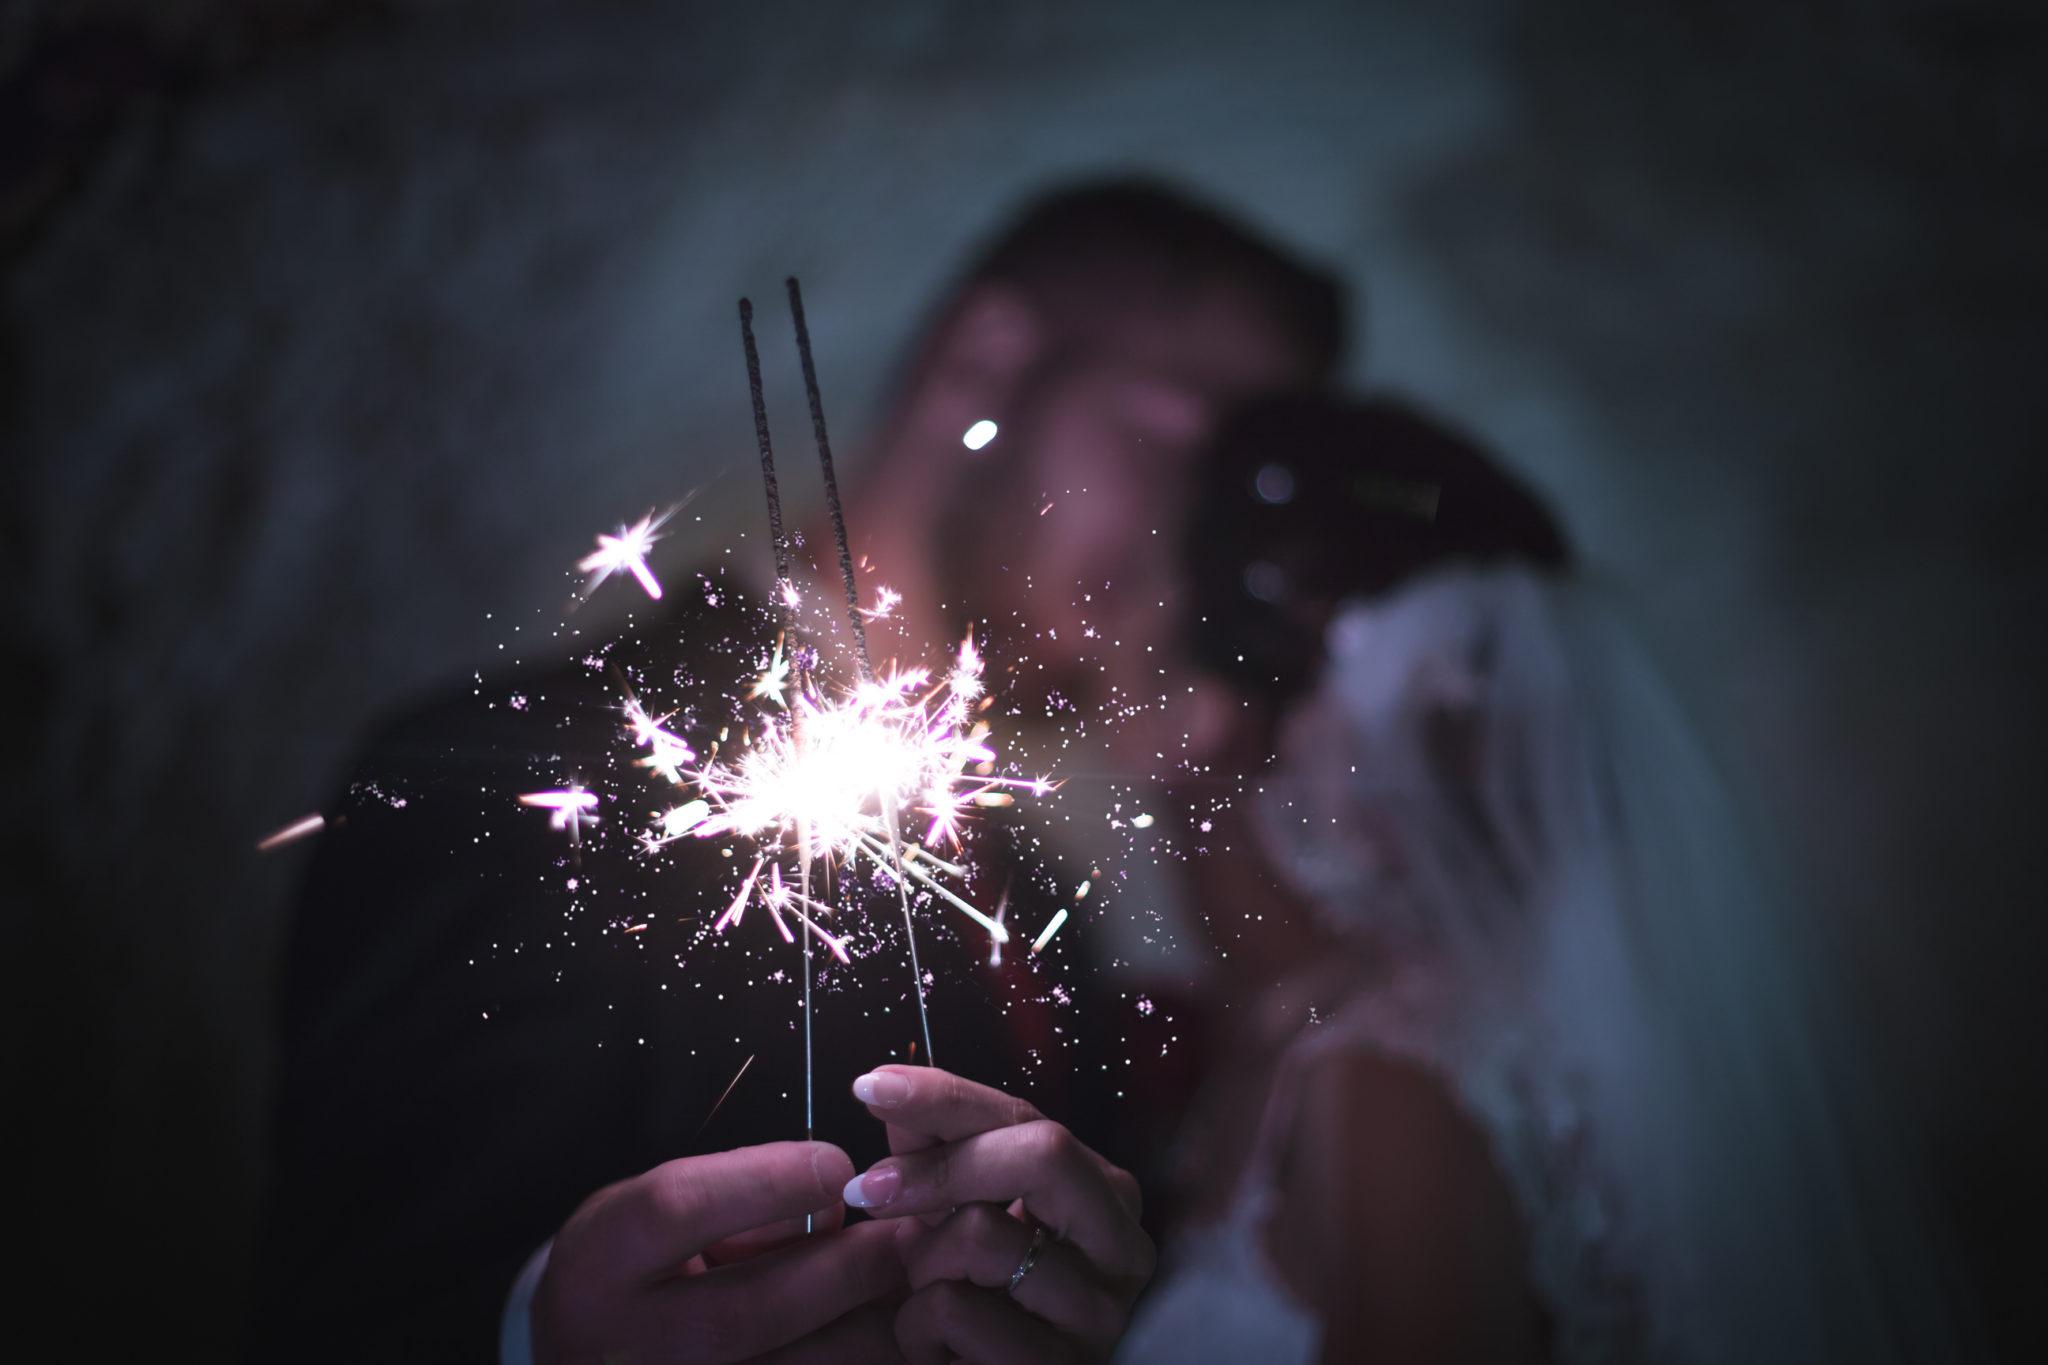 Photographe de mariage Yonne Auxerre sens joigny french photographer in burgundy wedding